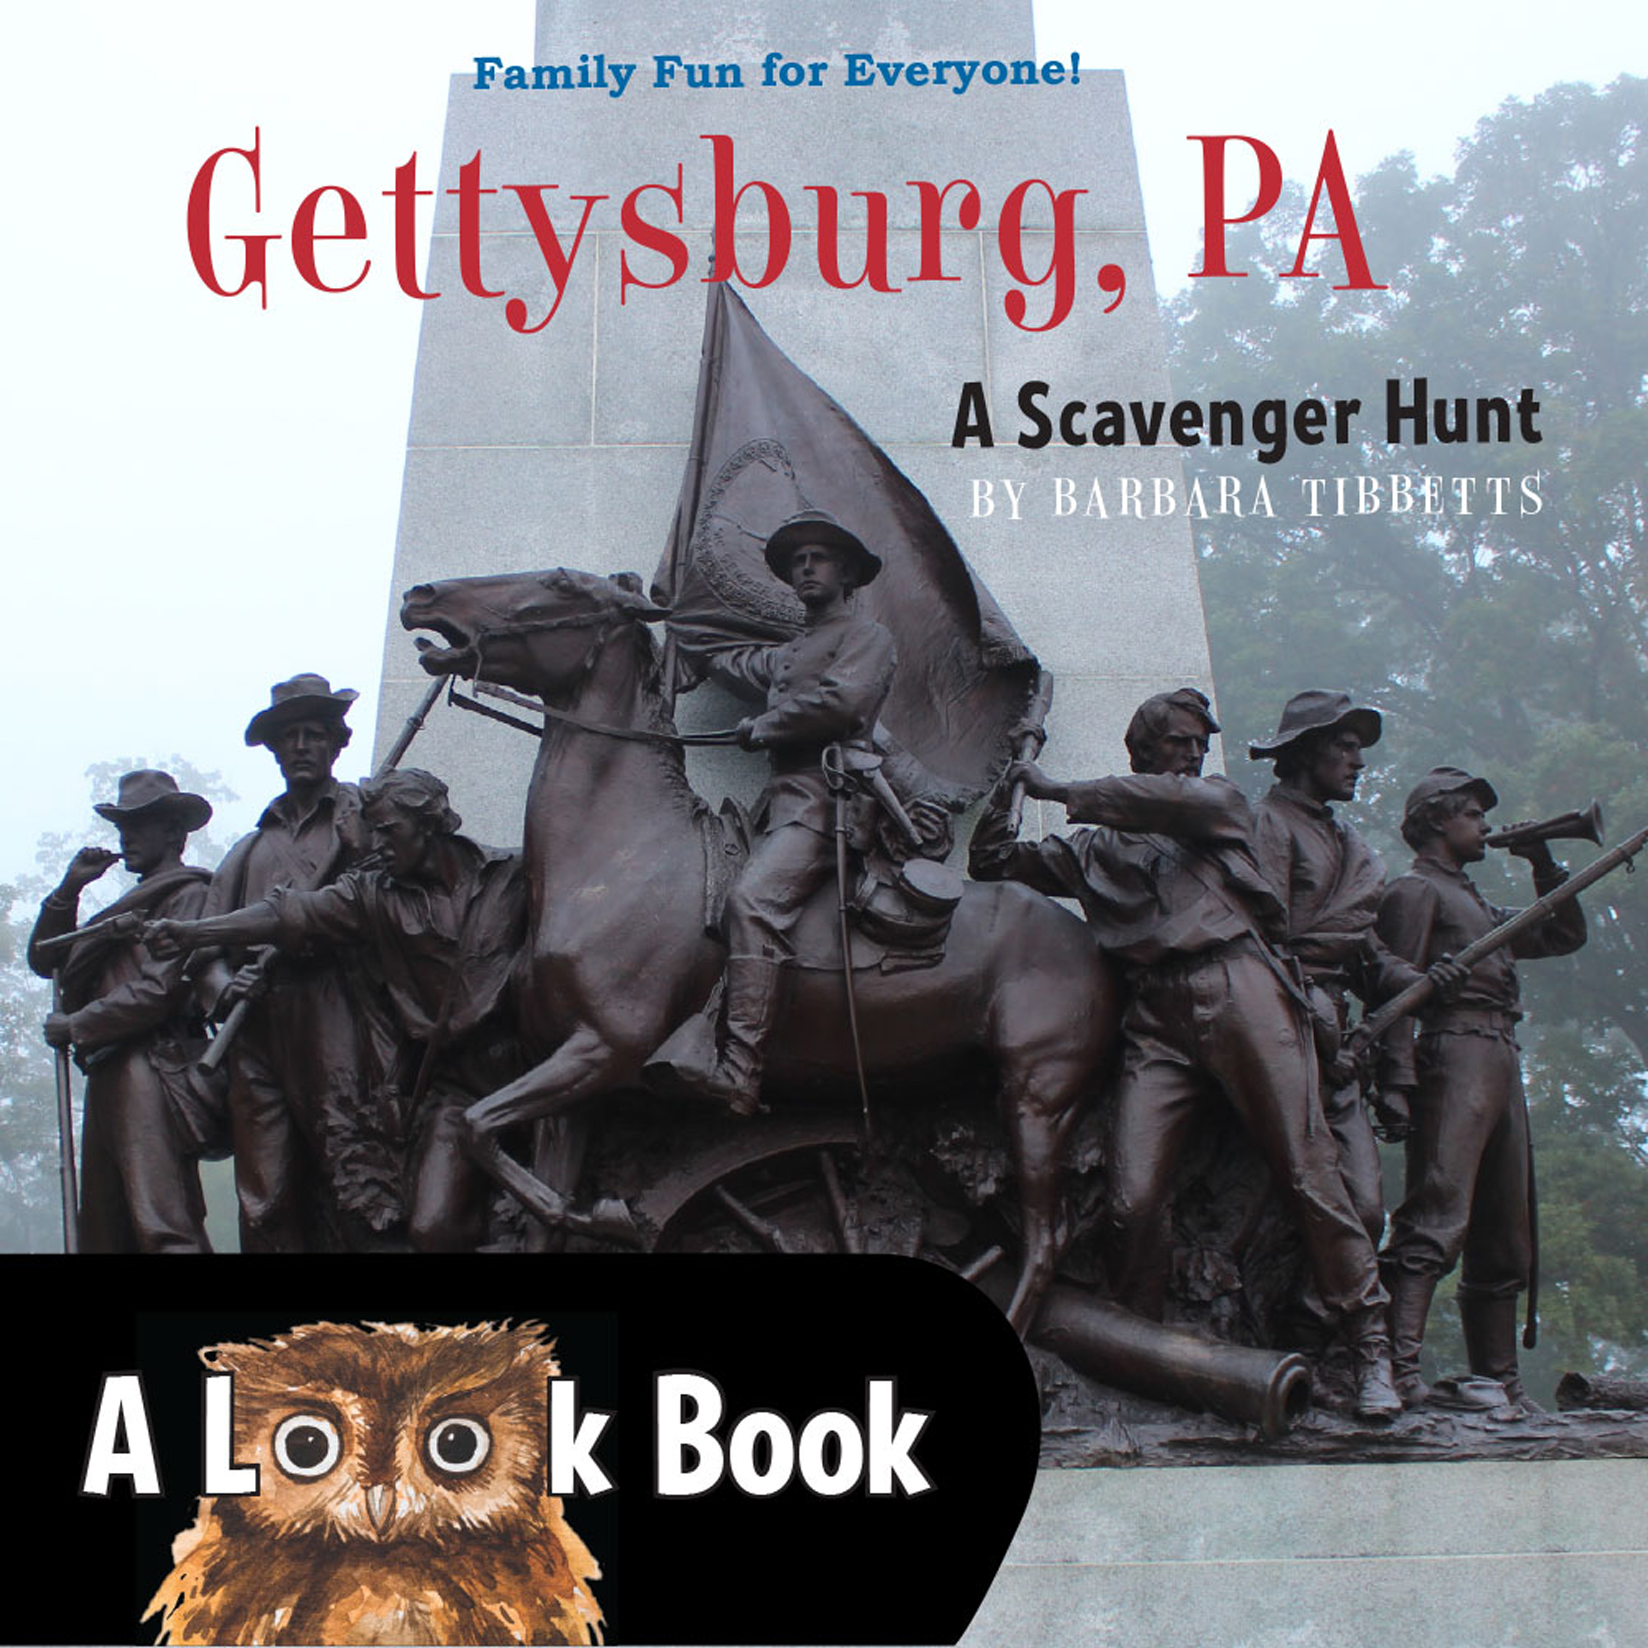 Gettysburg, PA – Look Book Scavenger Hunt